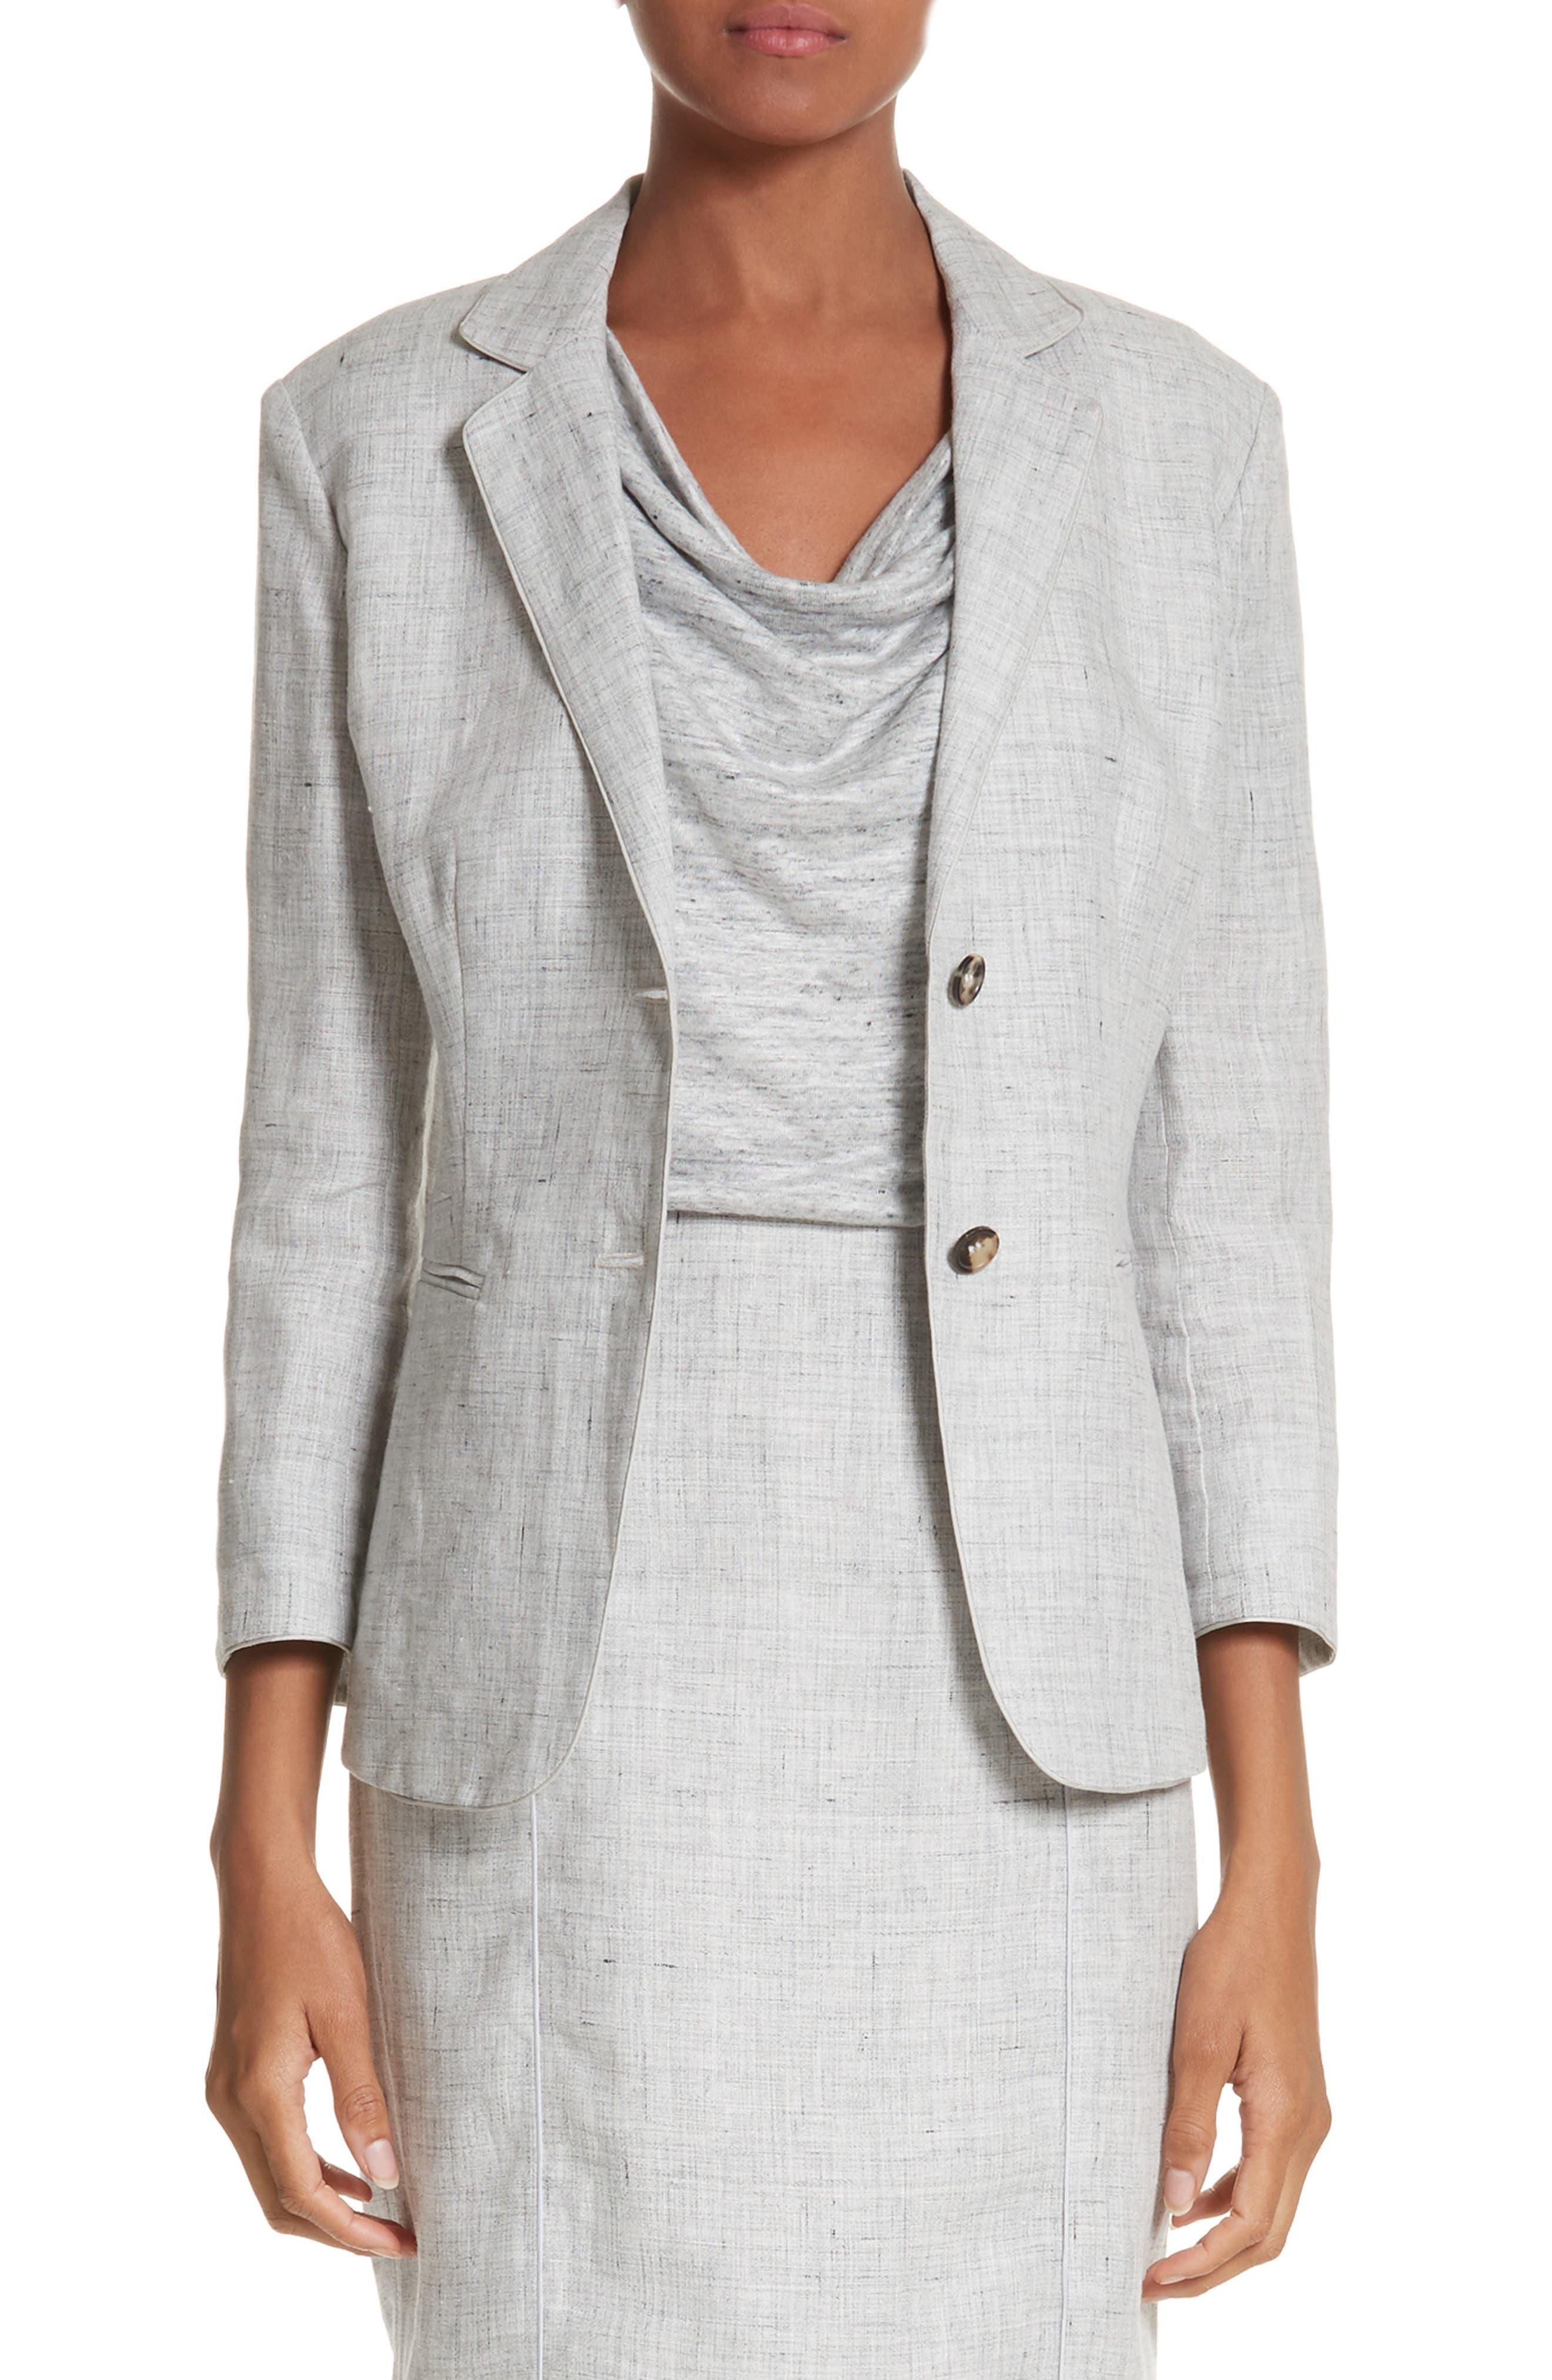 Vello Linen Blazer,                         Main,                         color, Light Grey